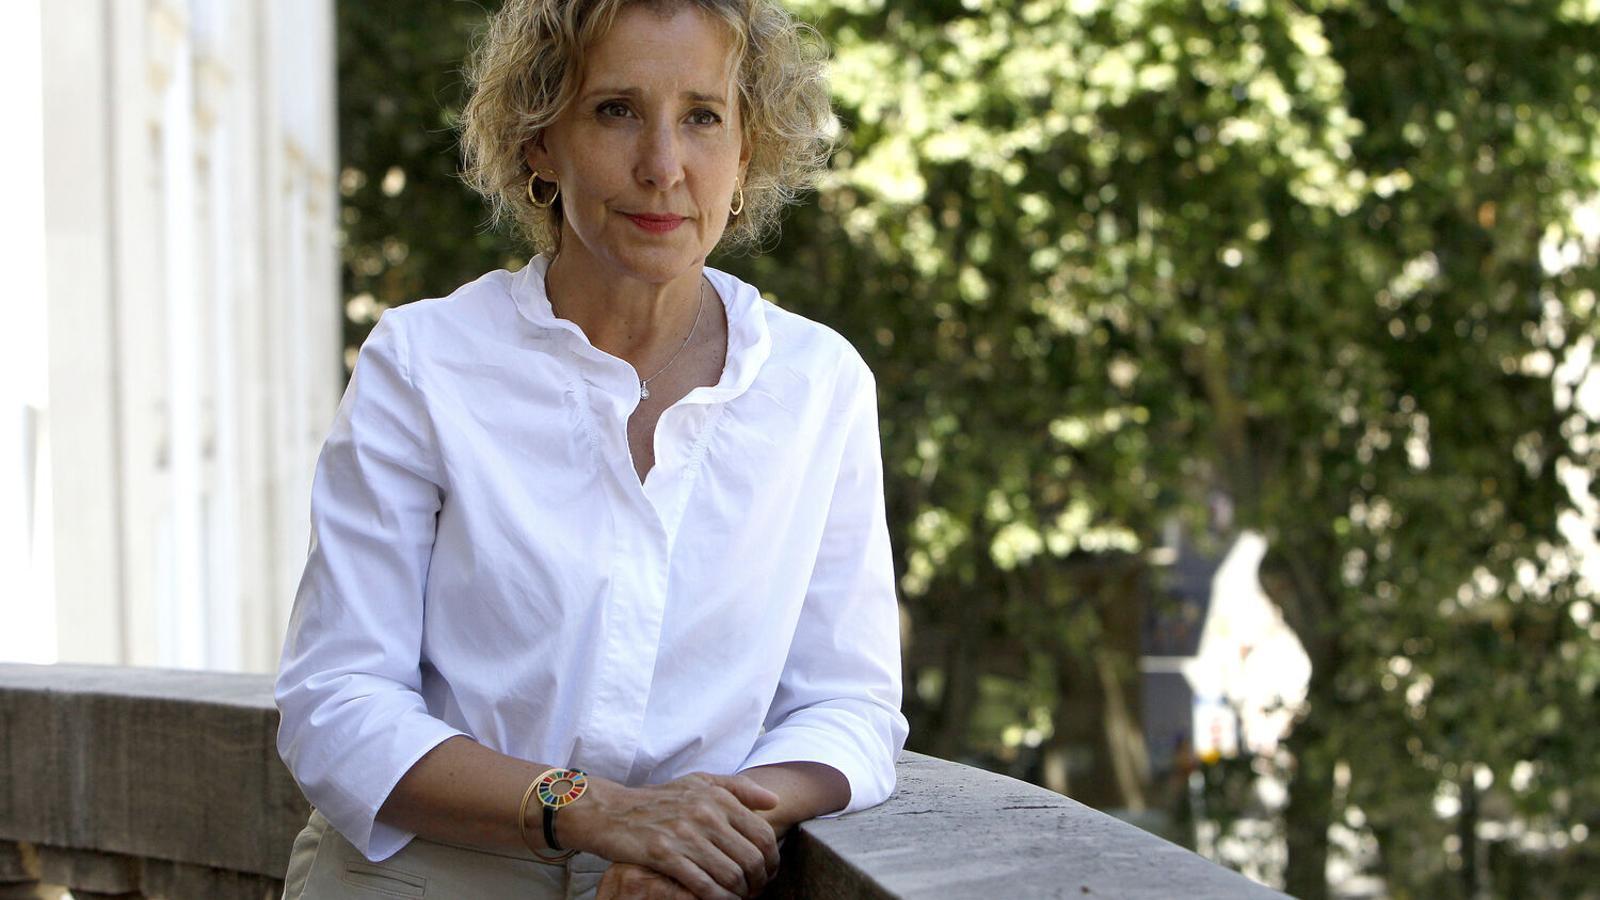 La delegada del govern espanyol a les Balears, Aina Calvo